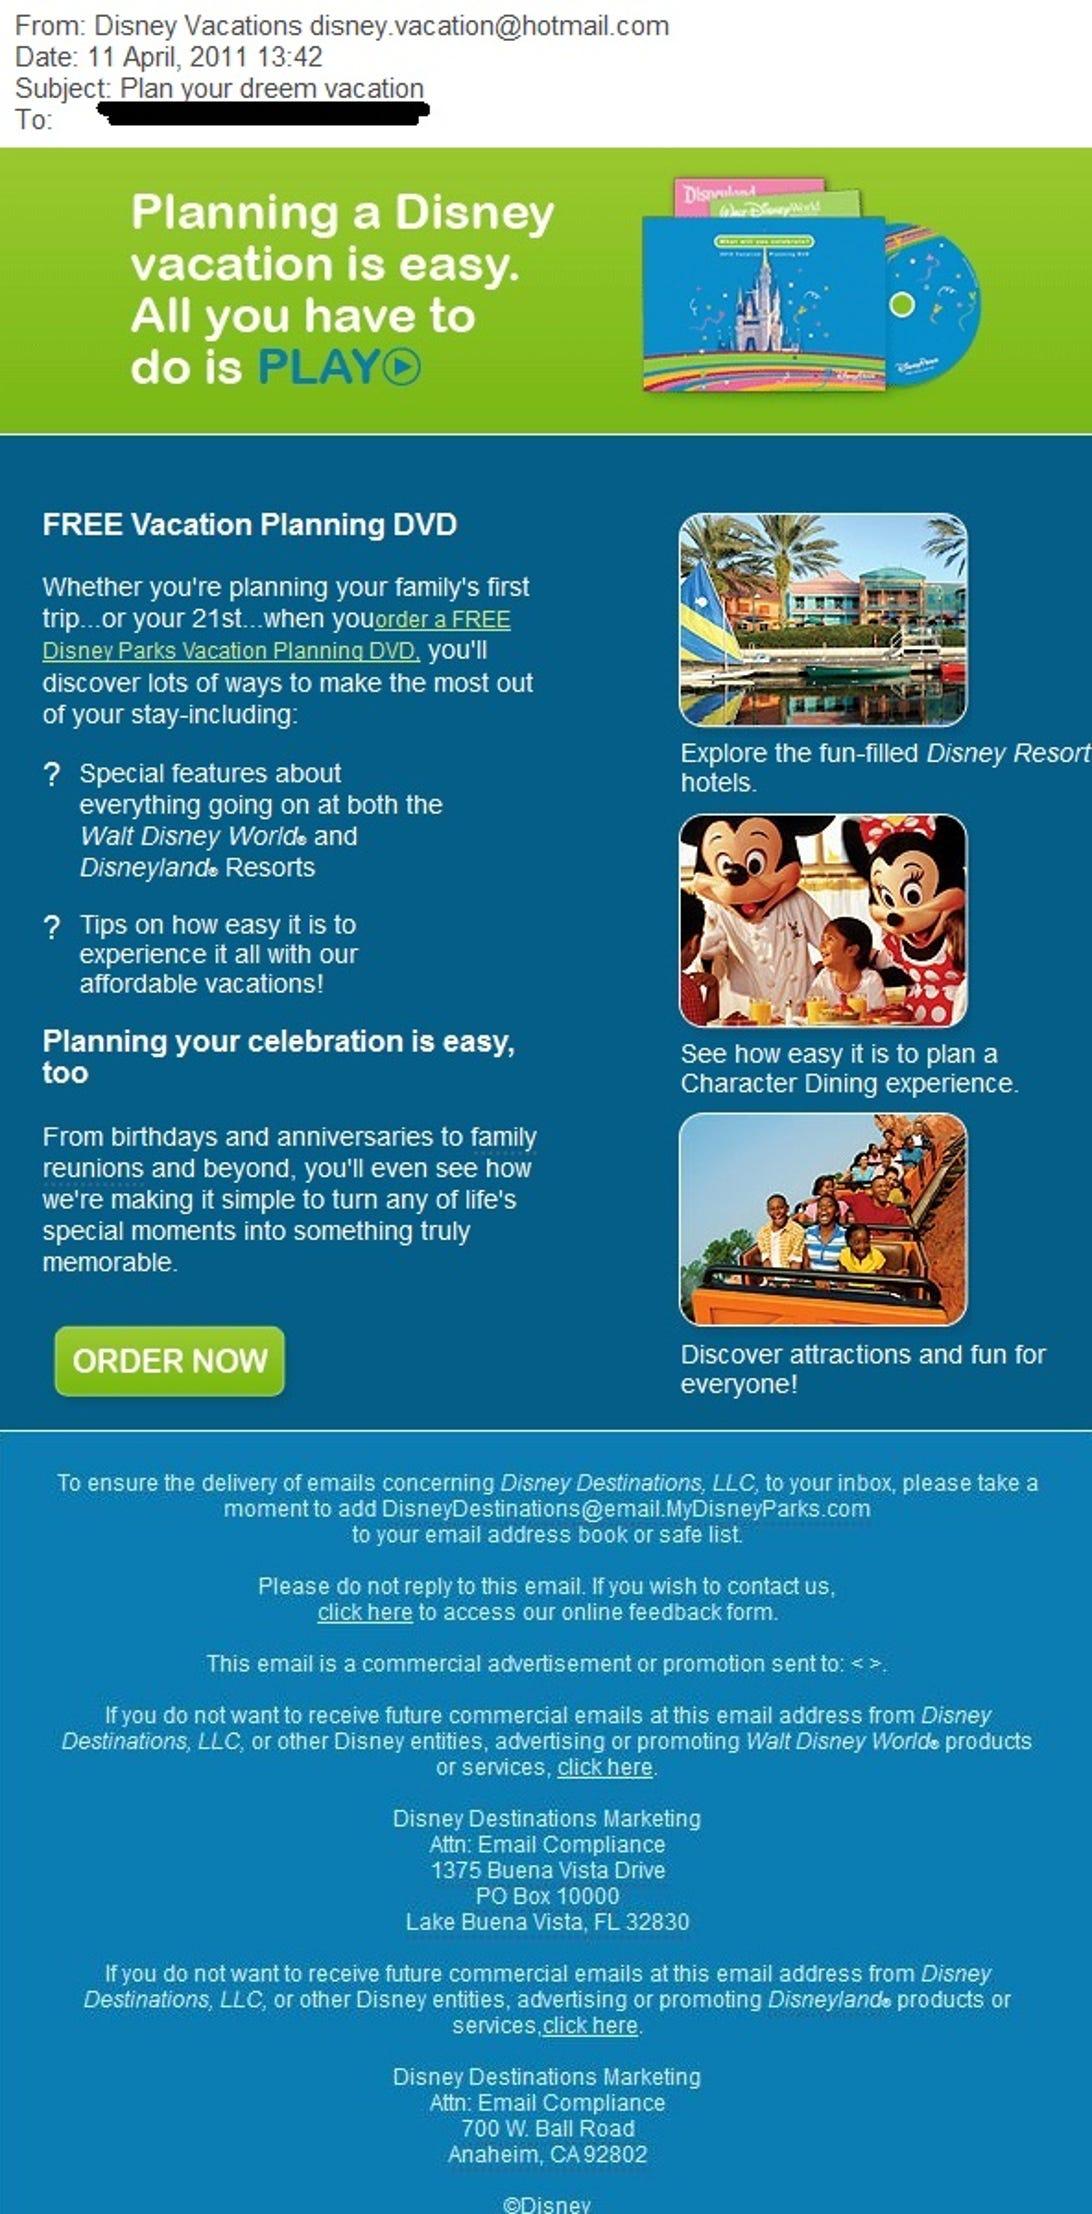 how-to-spot-a-phishing-scam-slidehow1.jpg